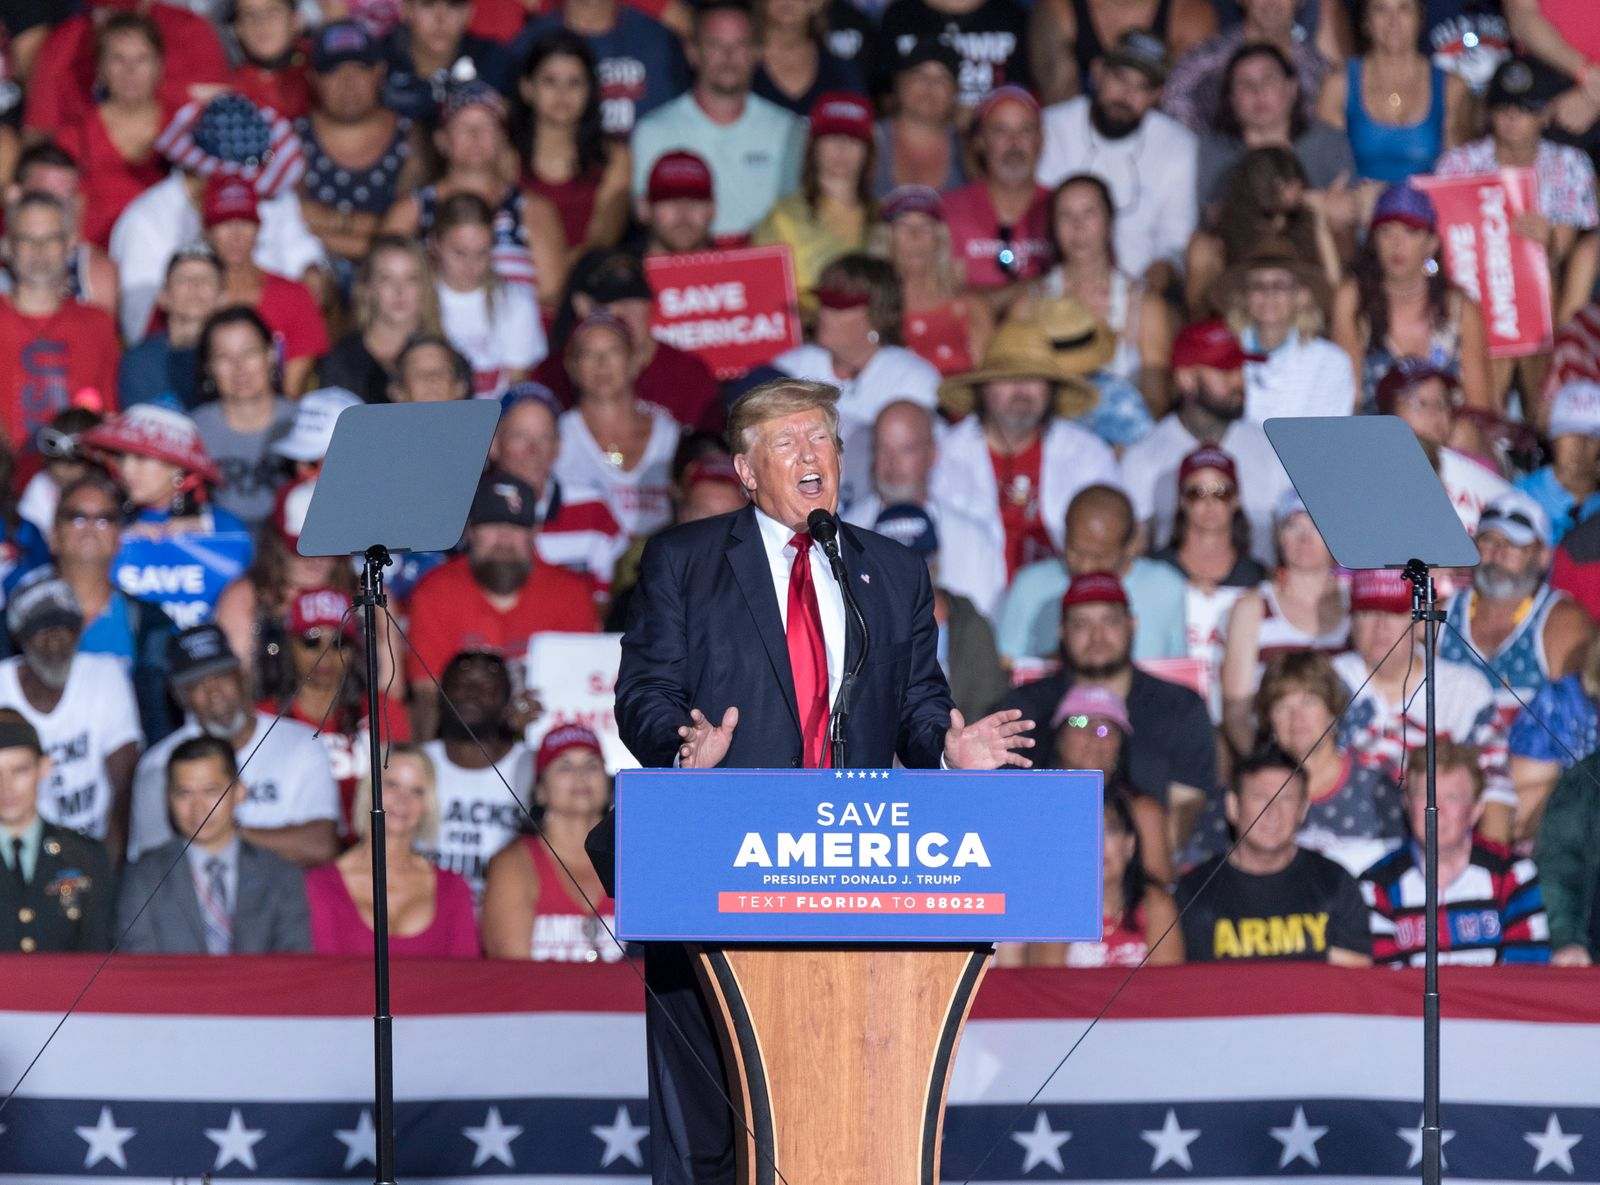 Former US President Donald J. Trump holds rally in Sarasota, Florida